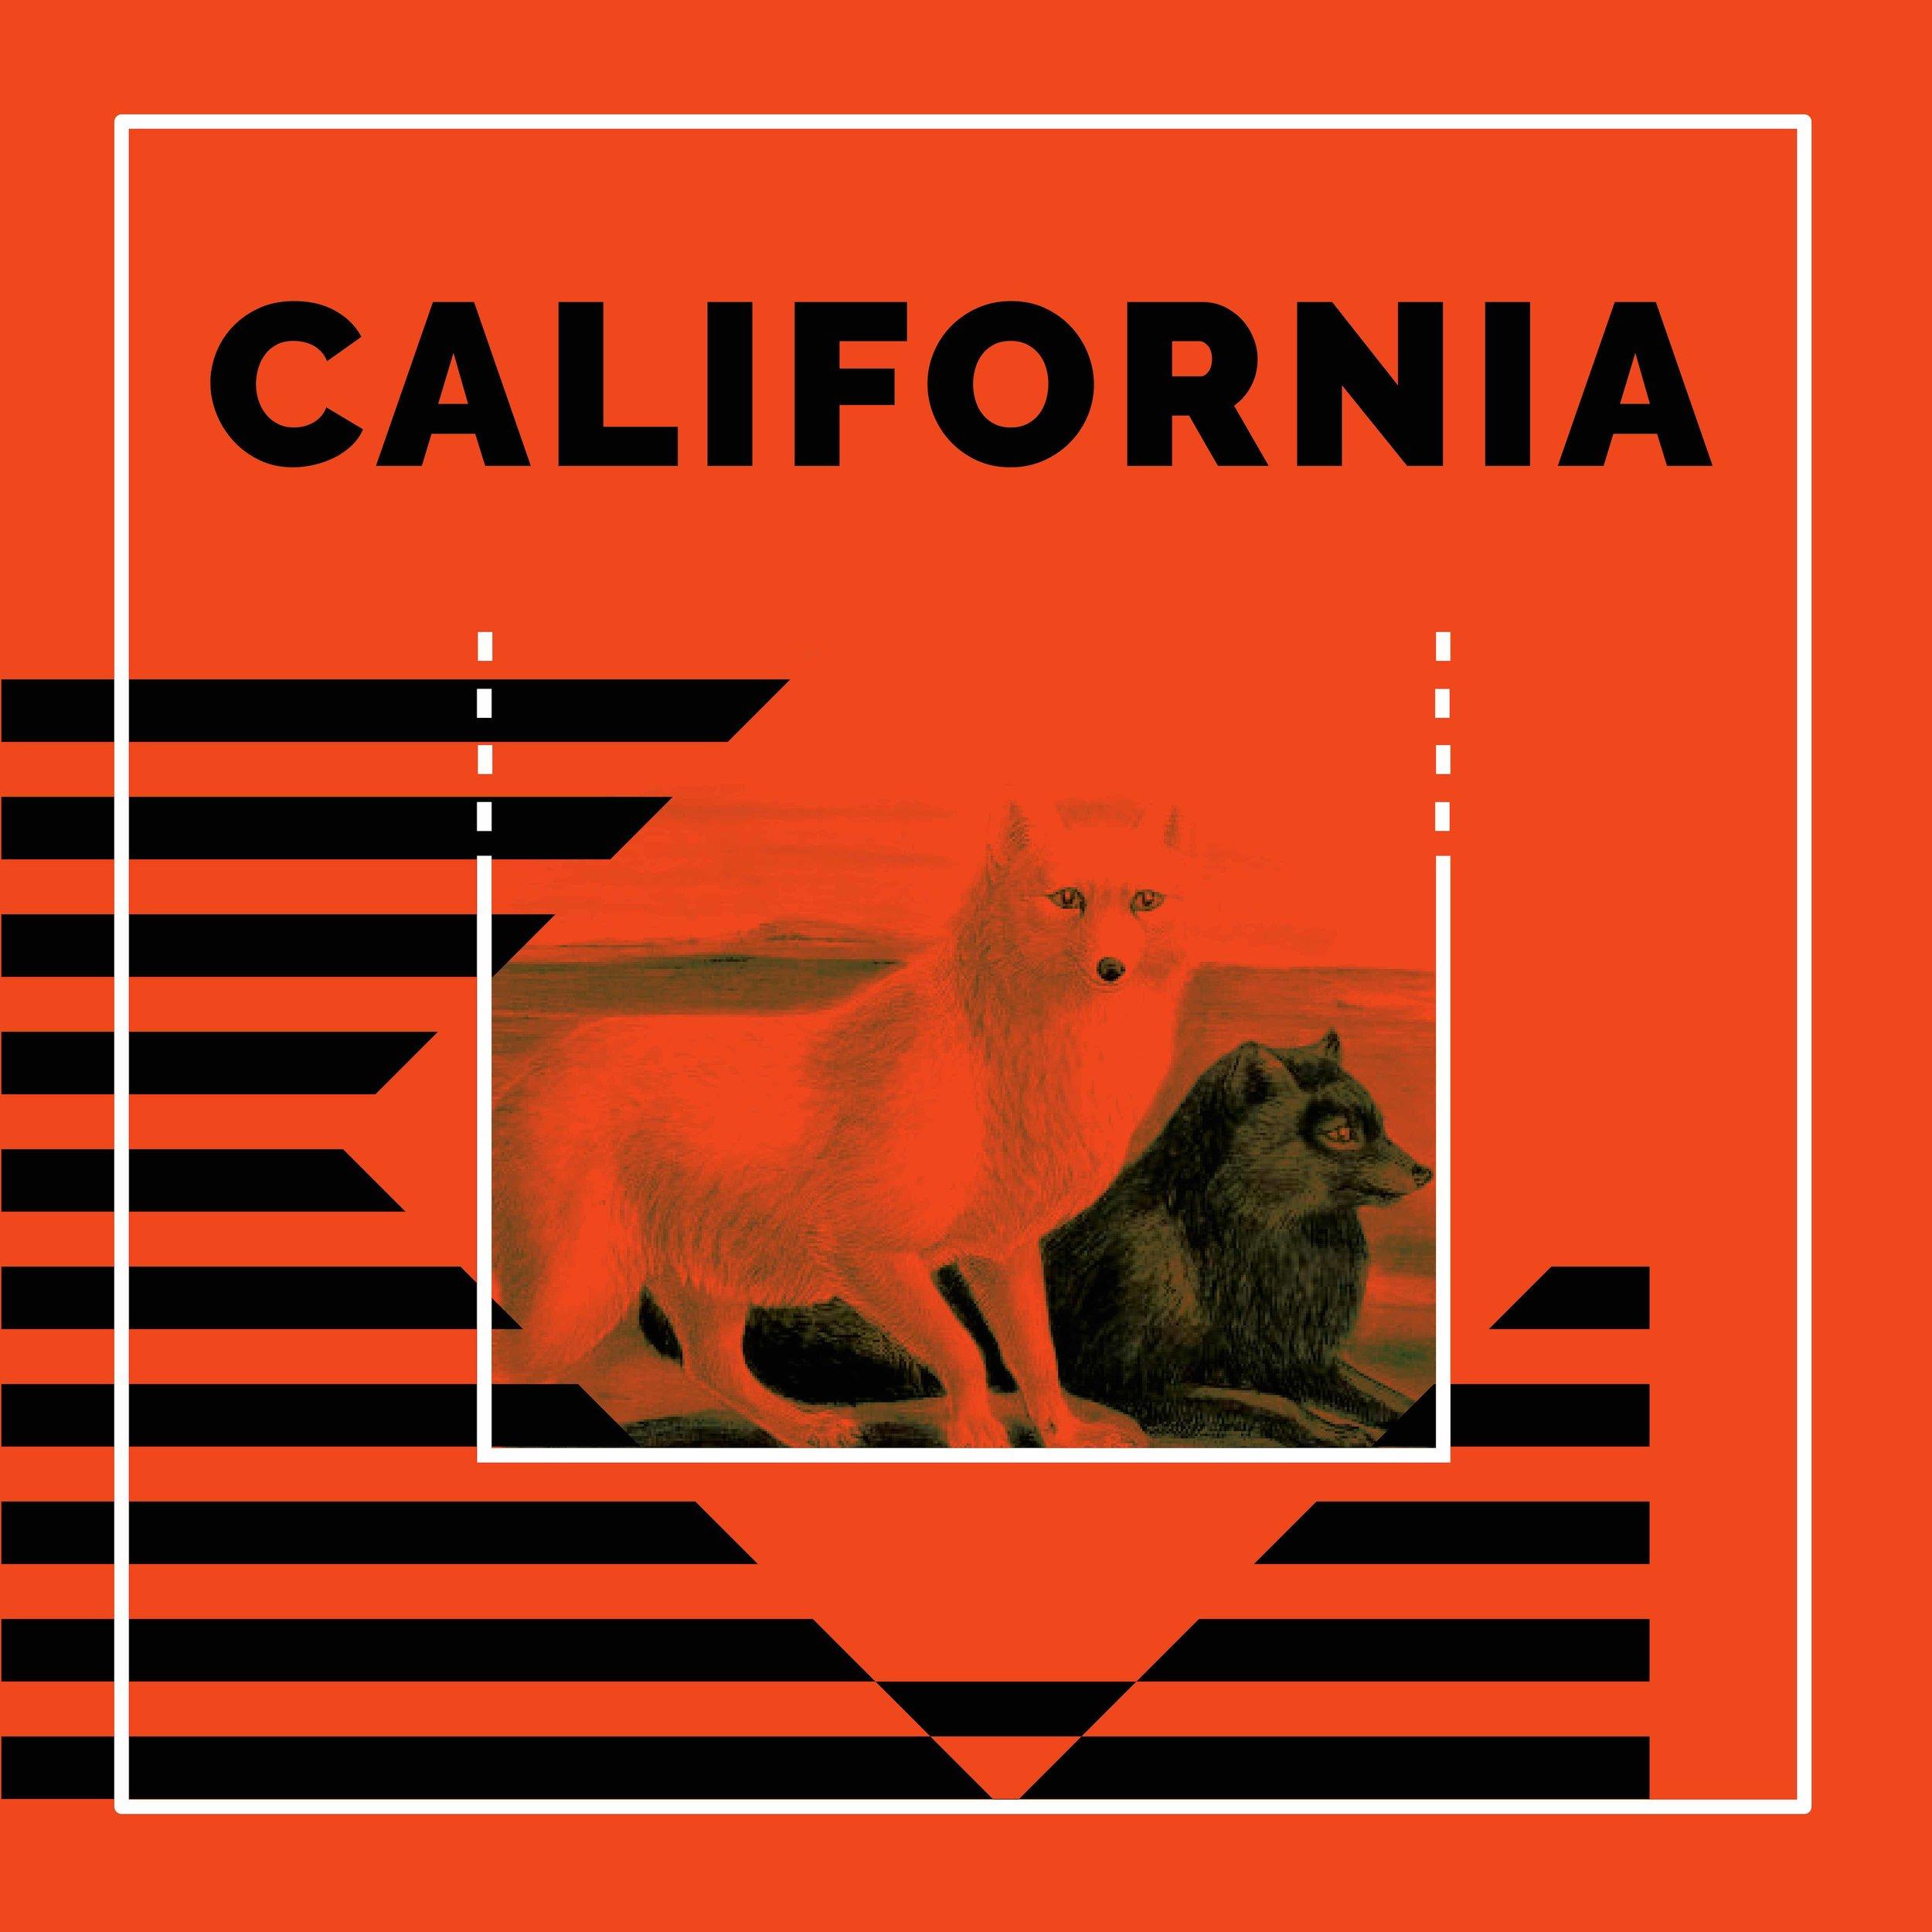 California_Single_Cover_larger_Artboard 2.jpg